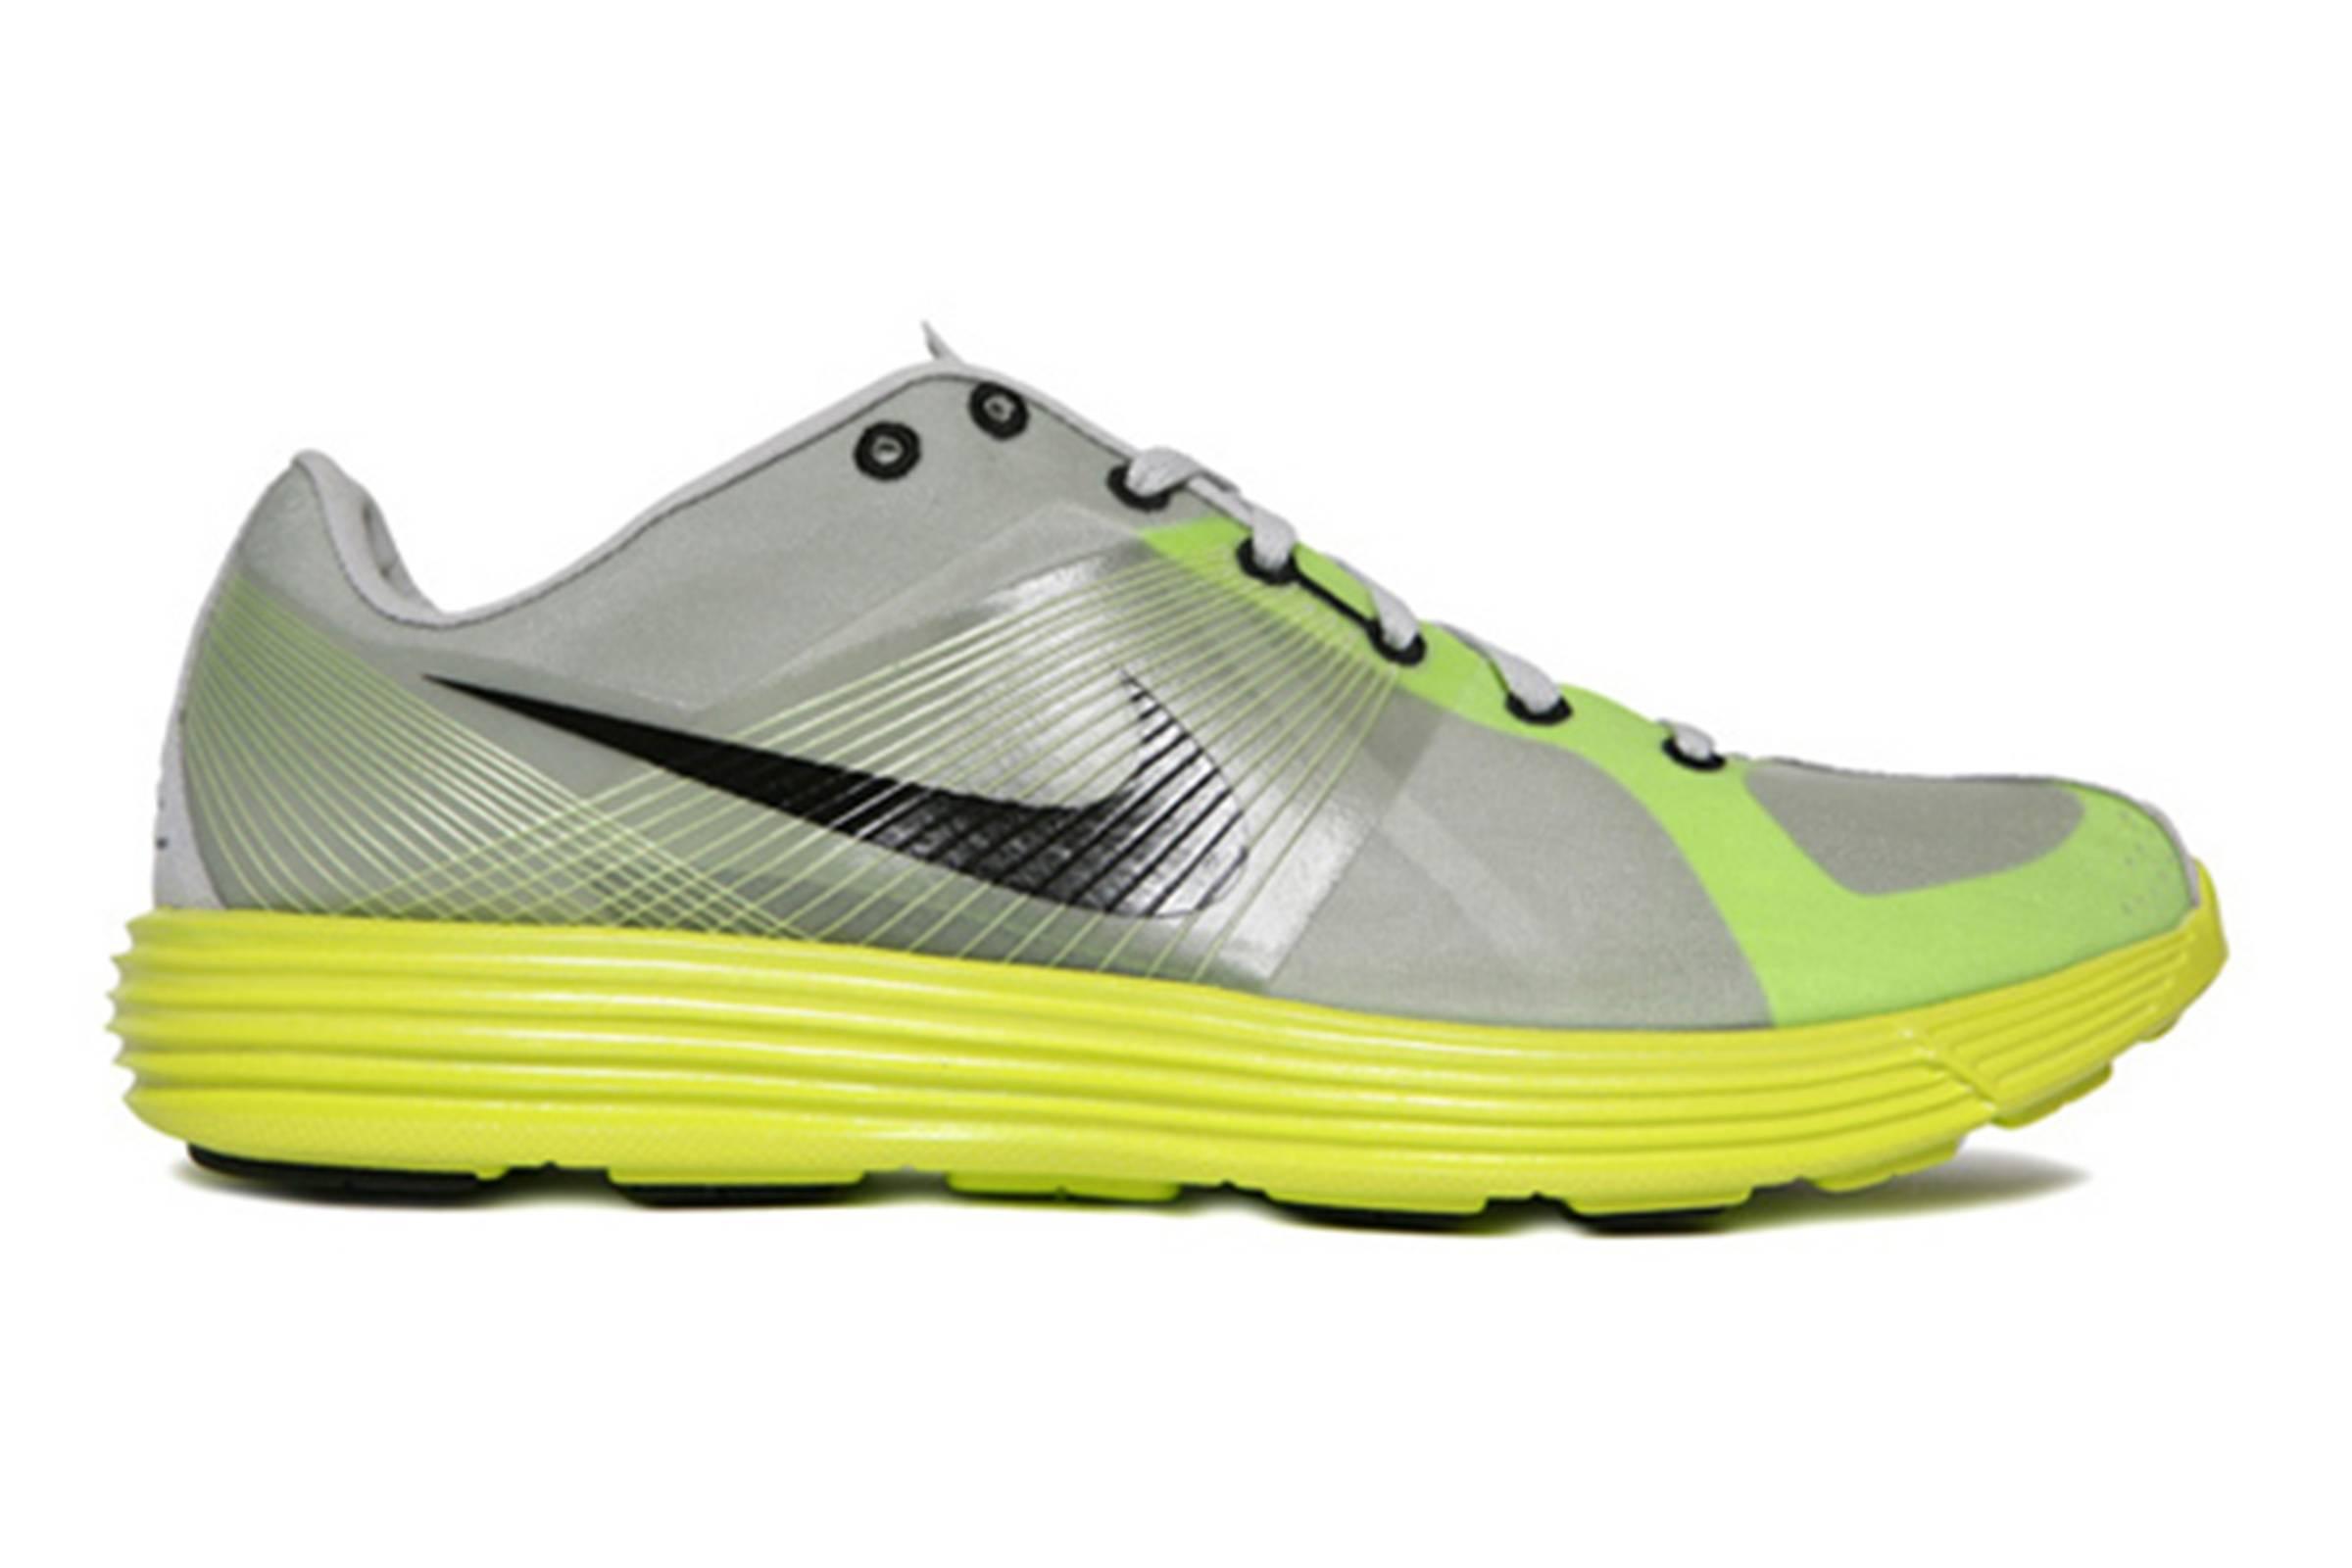 753f66b228e3 Reacting to Foam  A History of Nike React Technology - Nike React ...